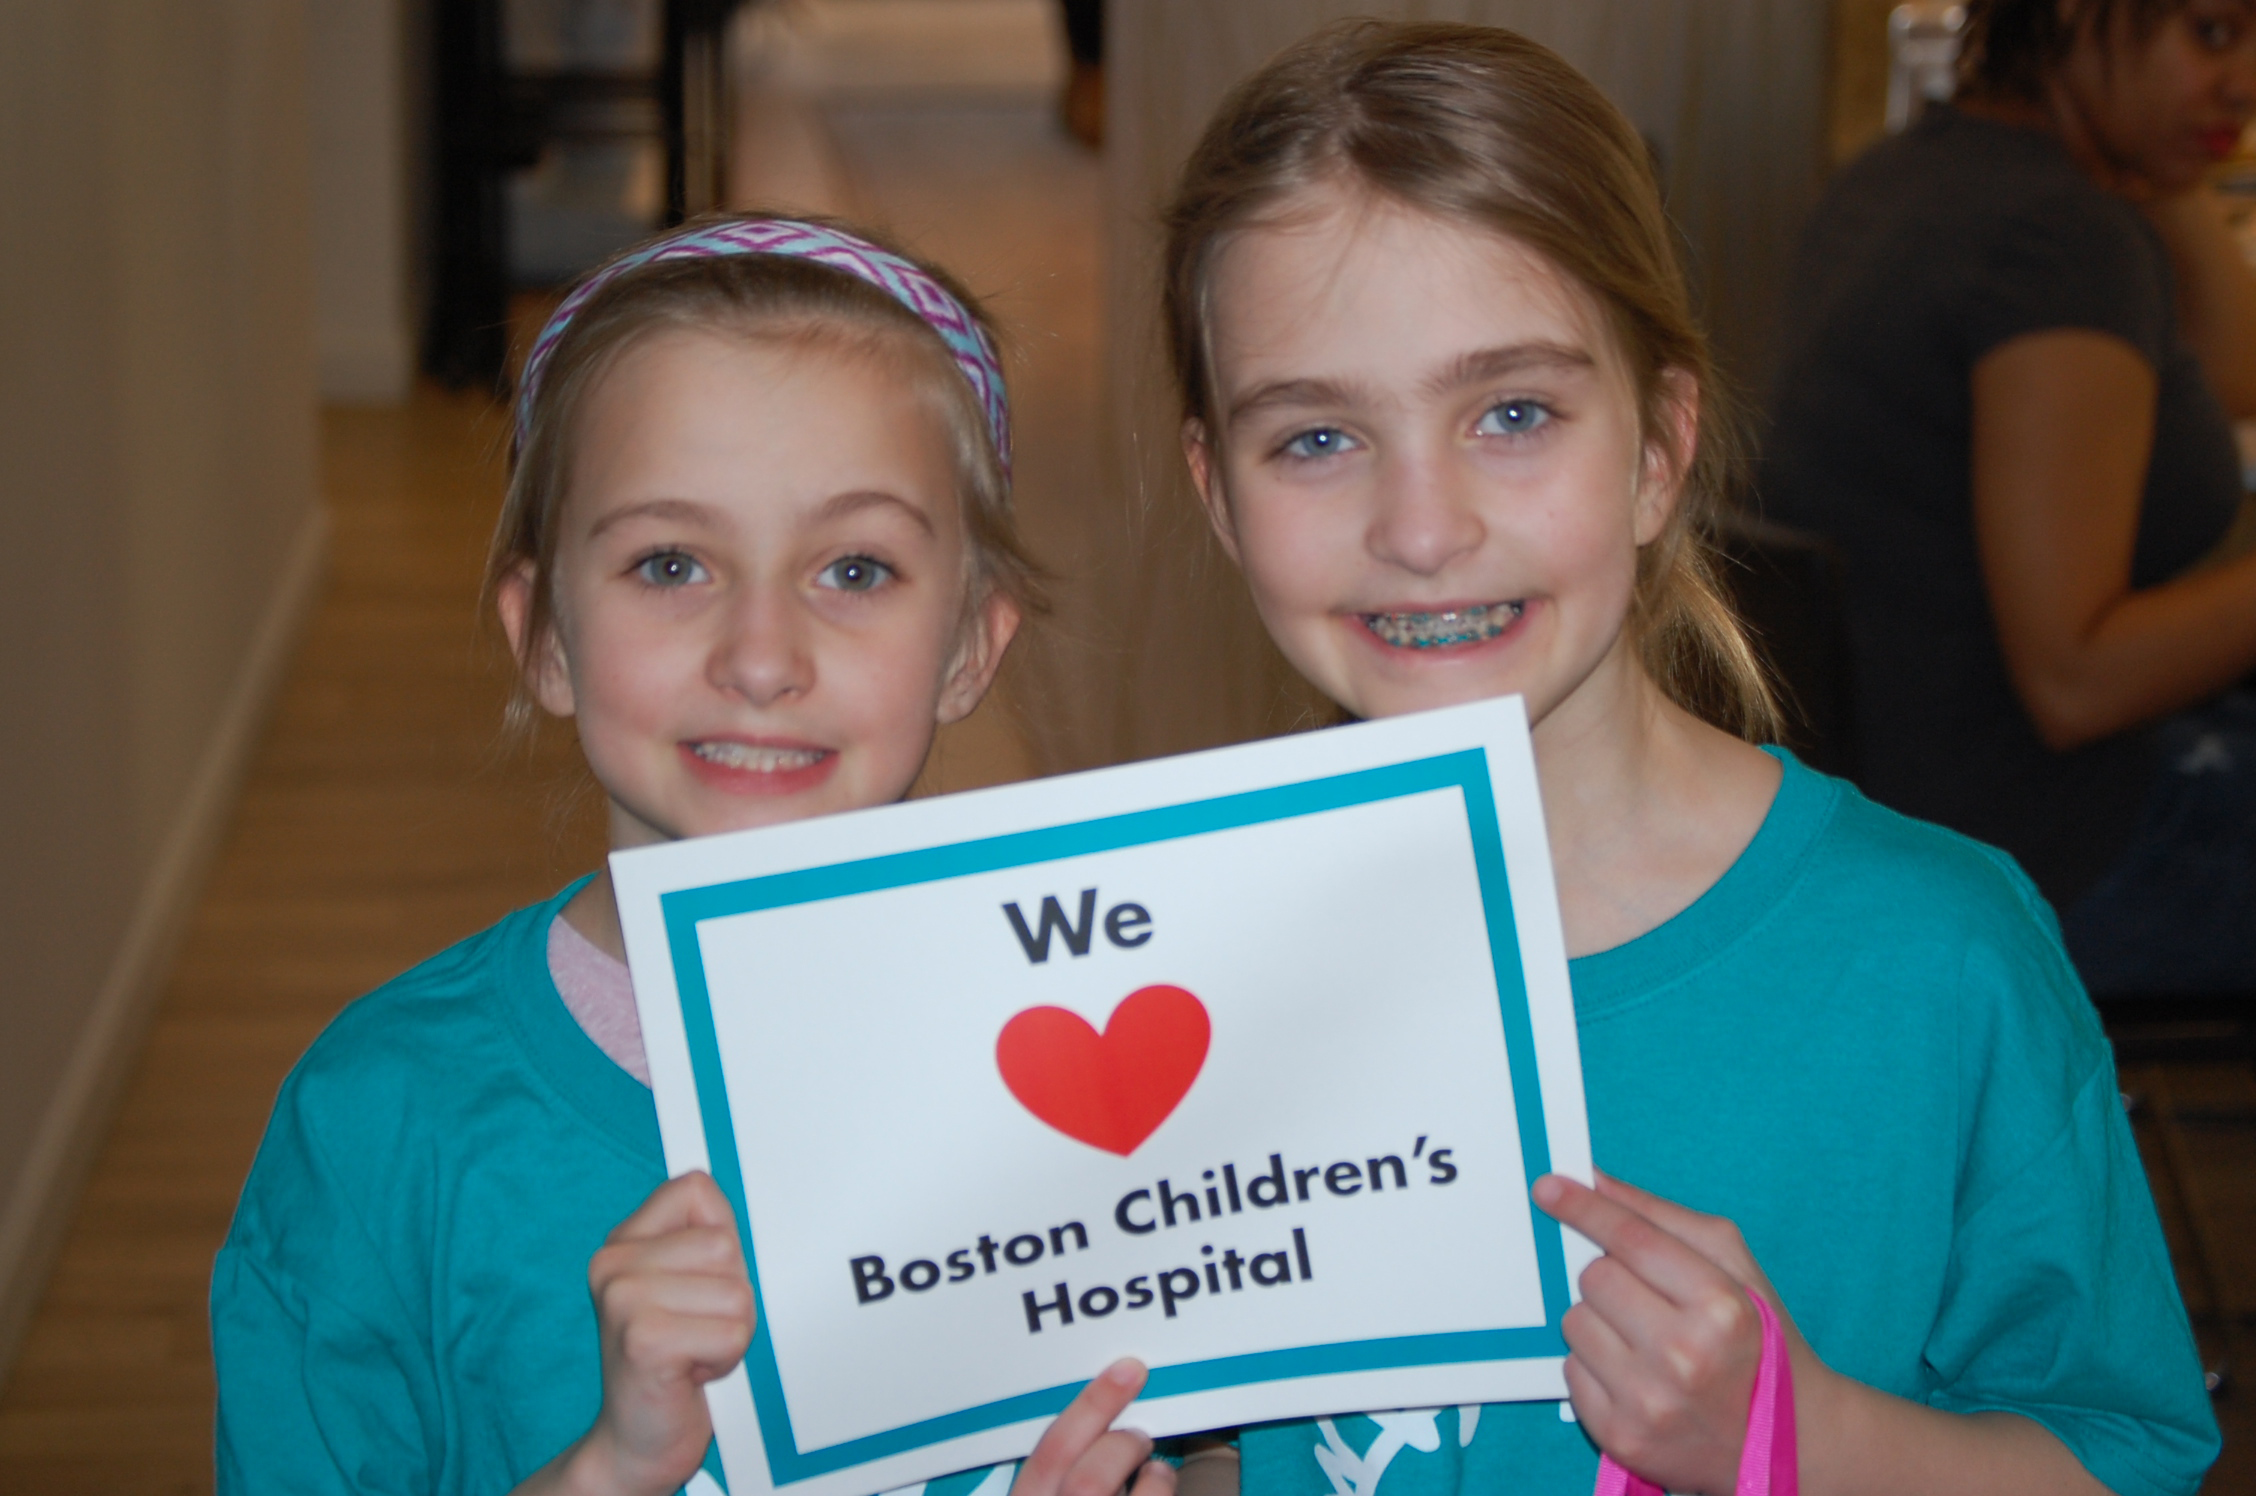 Join HAIRraising 2018 to Benefit Boston Children's Hospital